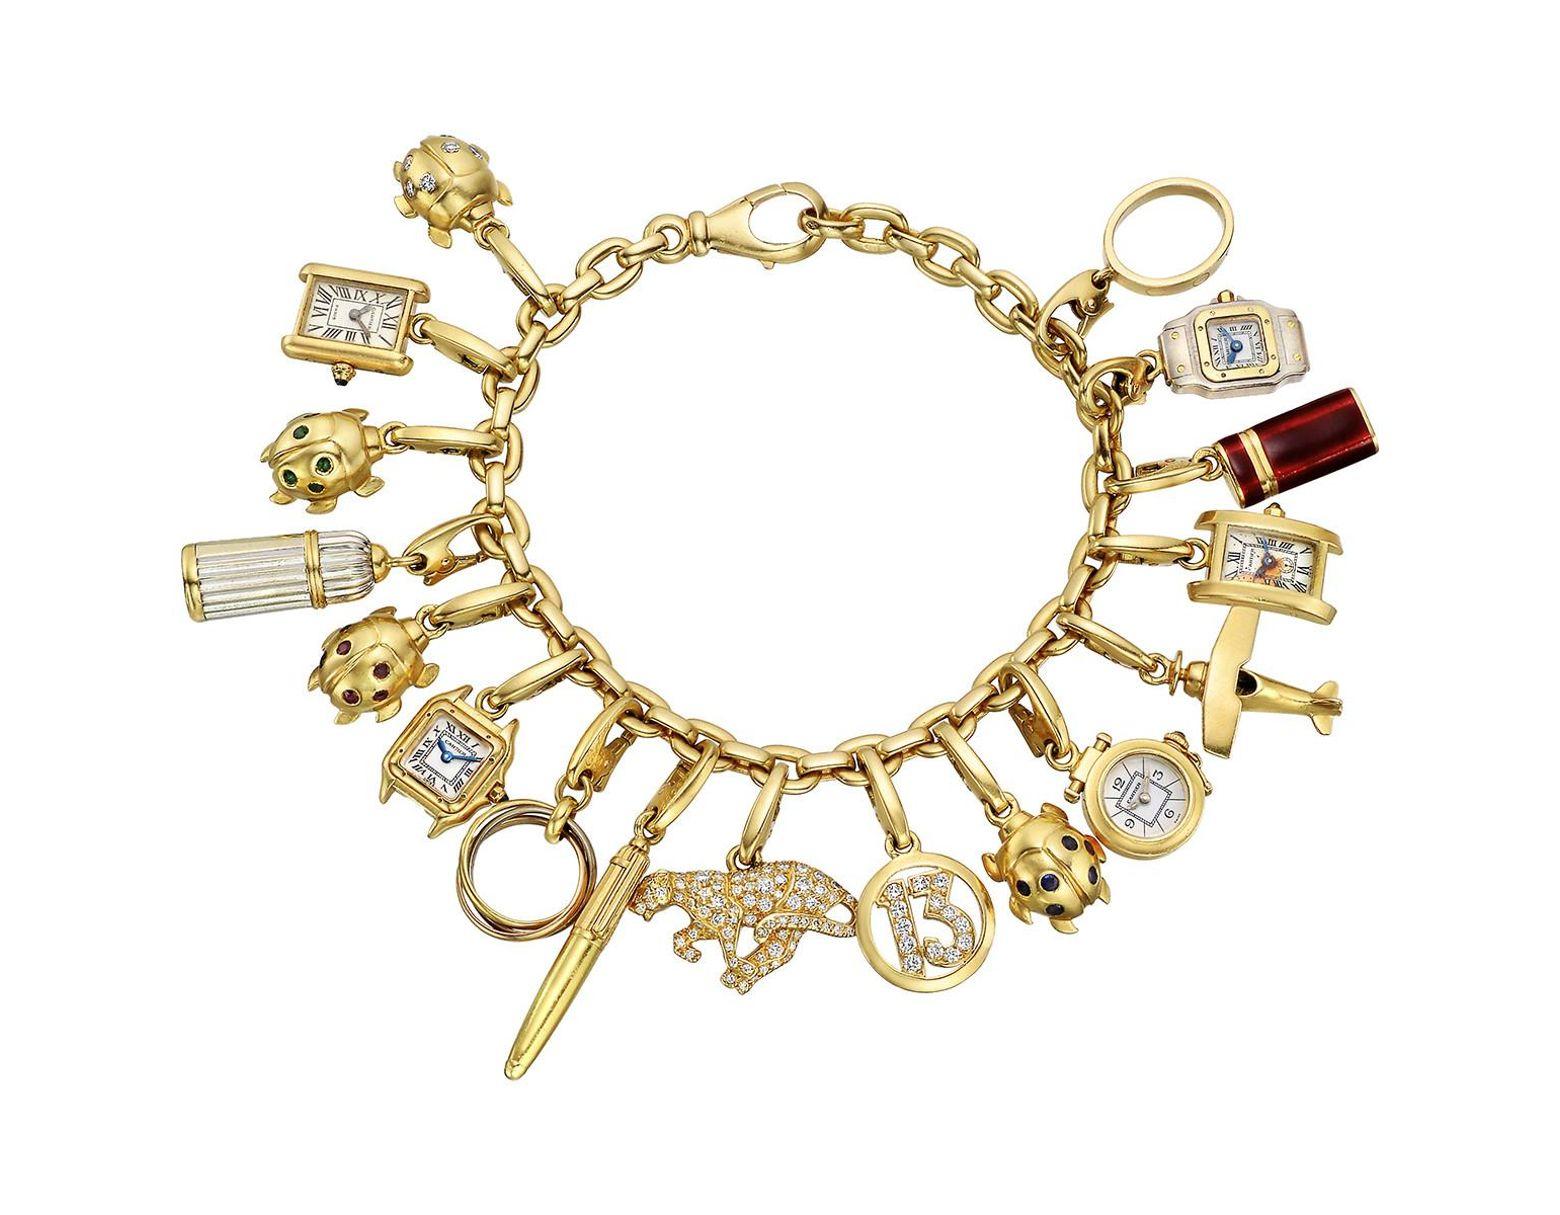 cbb58aabaecea Women's Vintage 18k Yellow Gold Charm Bracelet